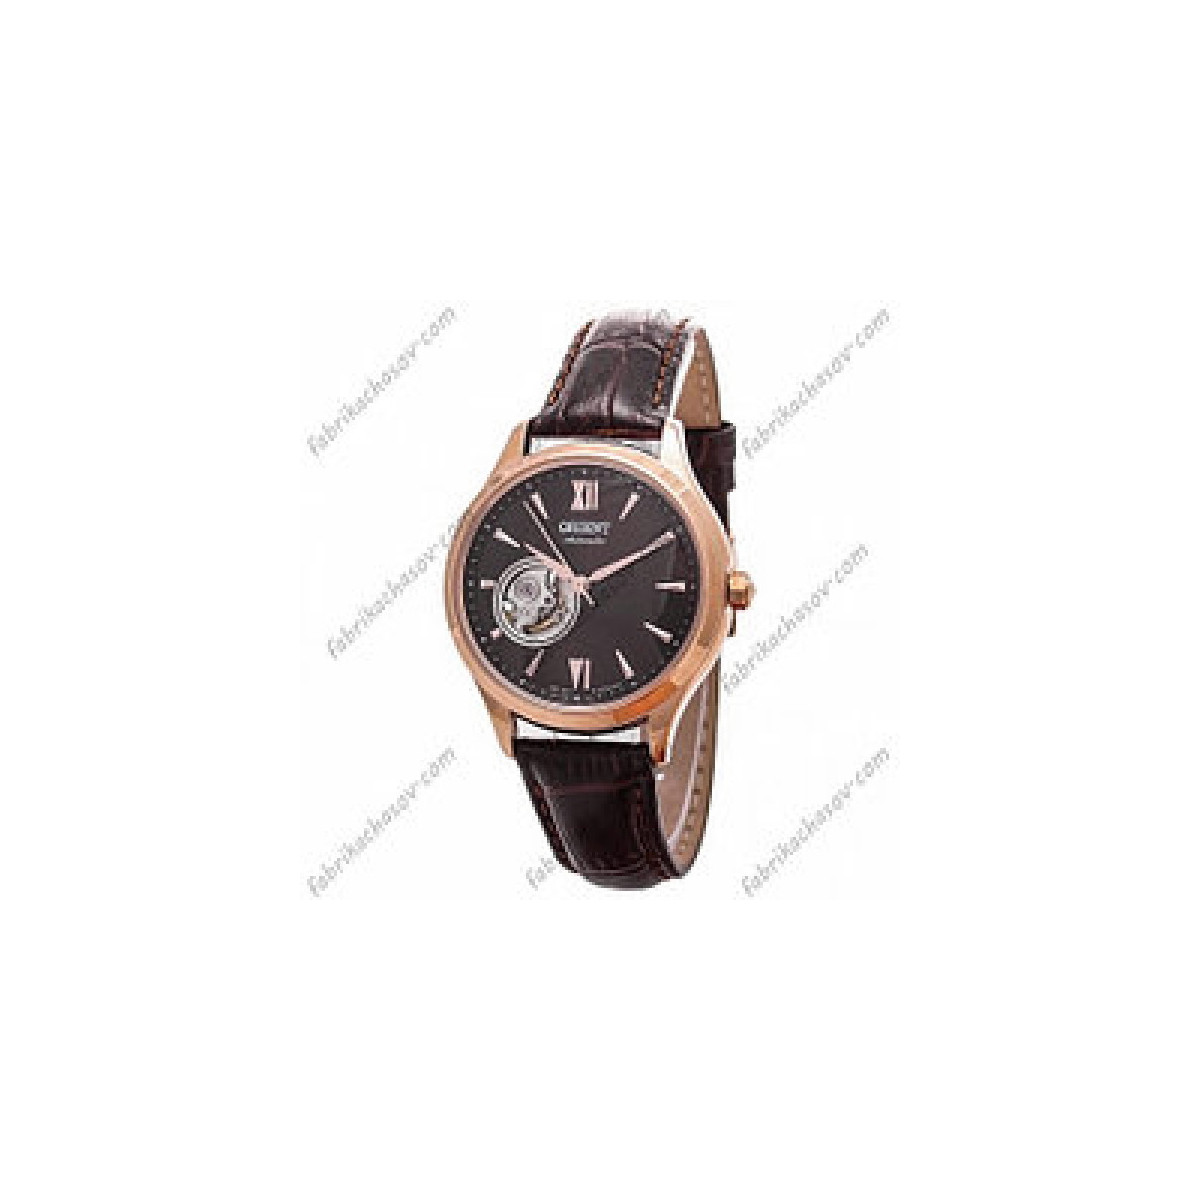 Reloj Orient - FDBOA001TO